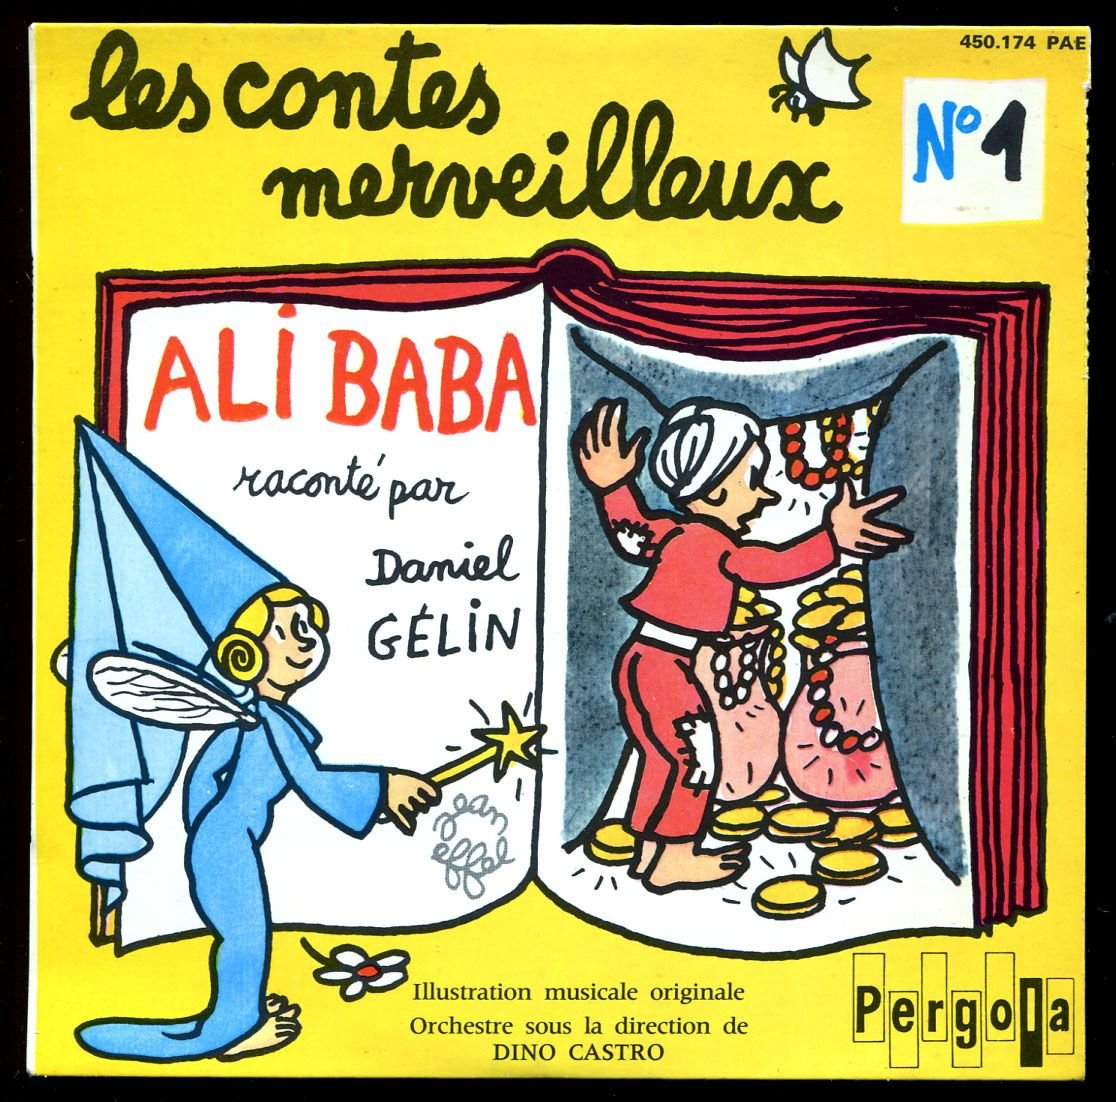 Philips Pergola 450.174 - Ali Baba raconté par Ganiel Gélin ...